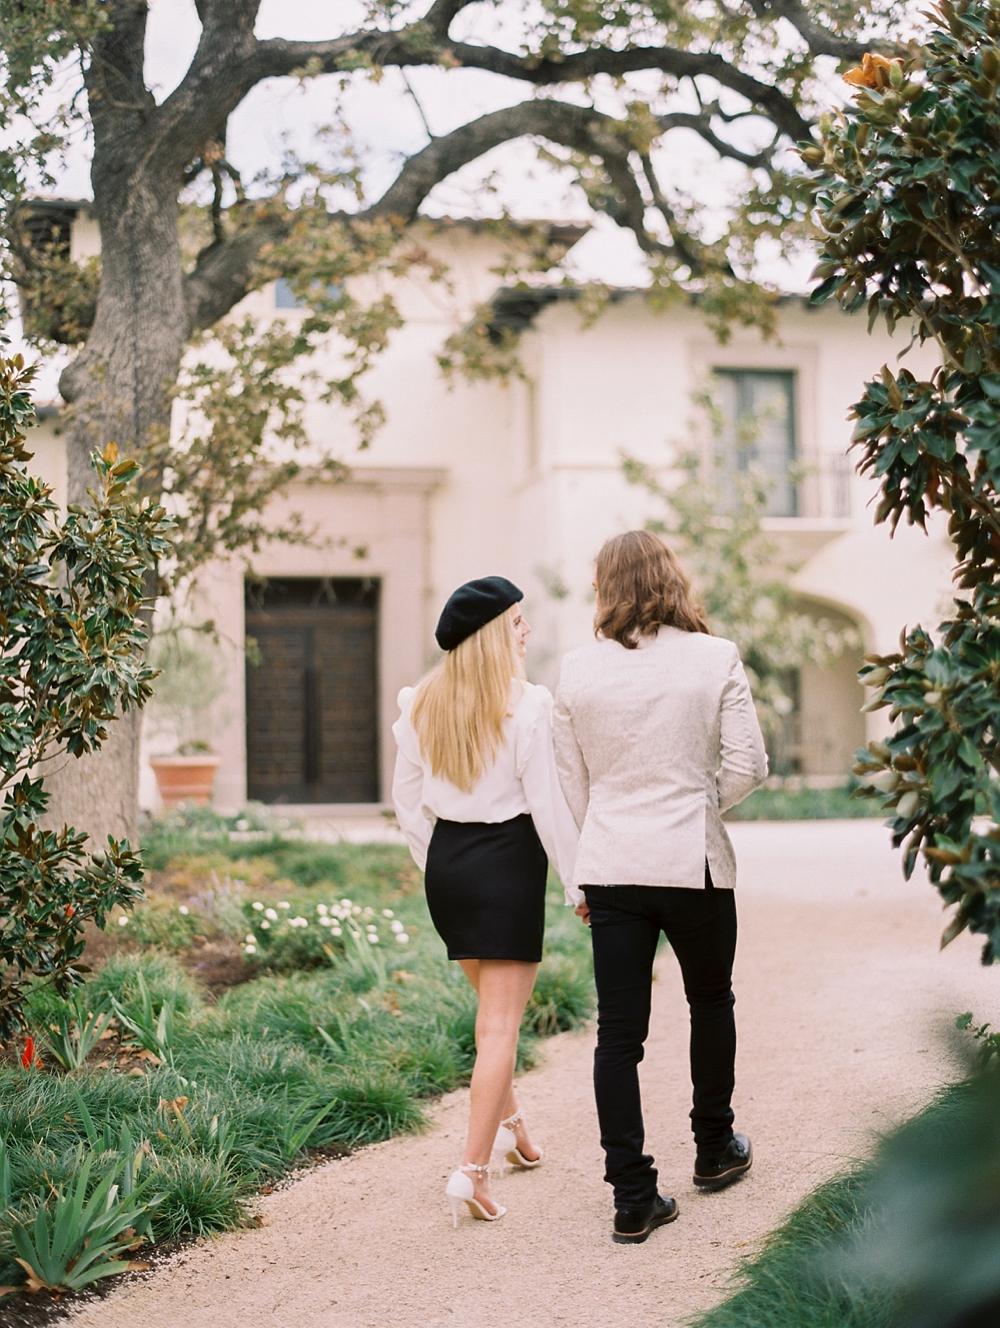 kristin-la-voie-photography-Austin-Wedding-Boudoir-Photographer-Commodore-Perry-Estate-79